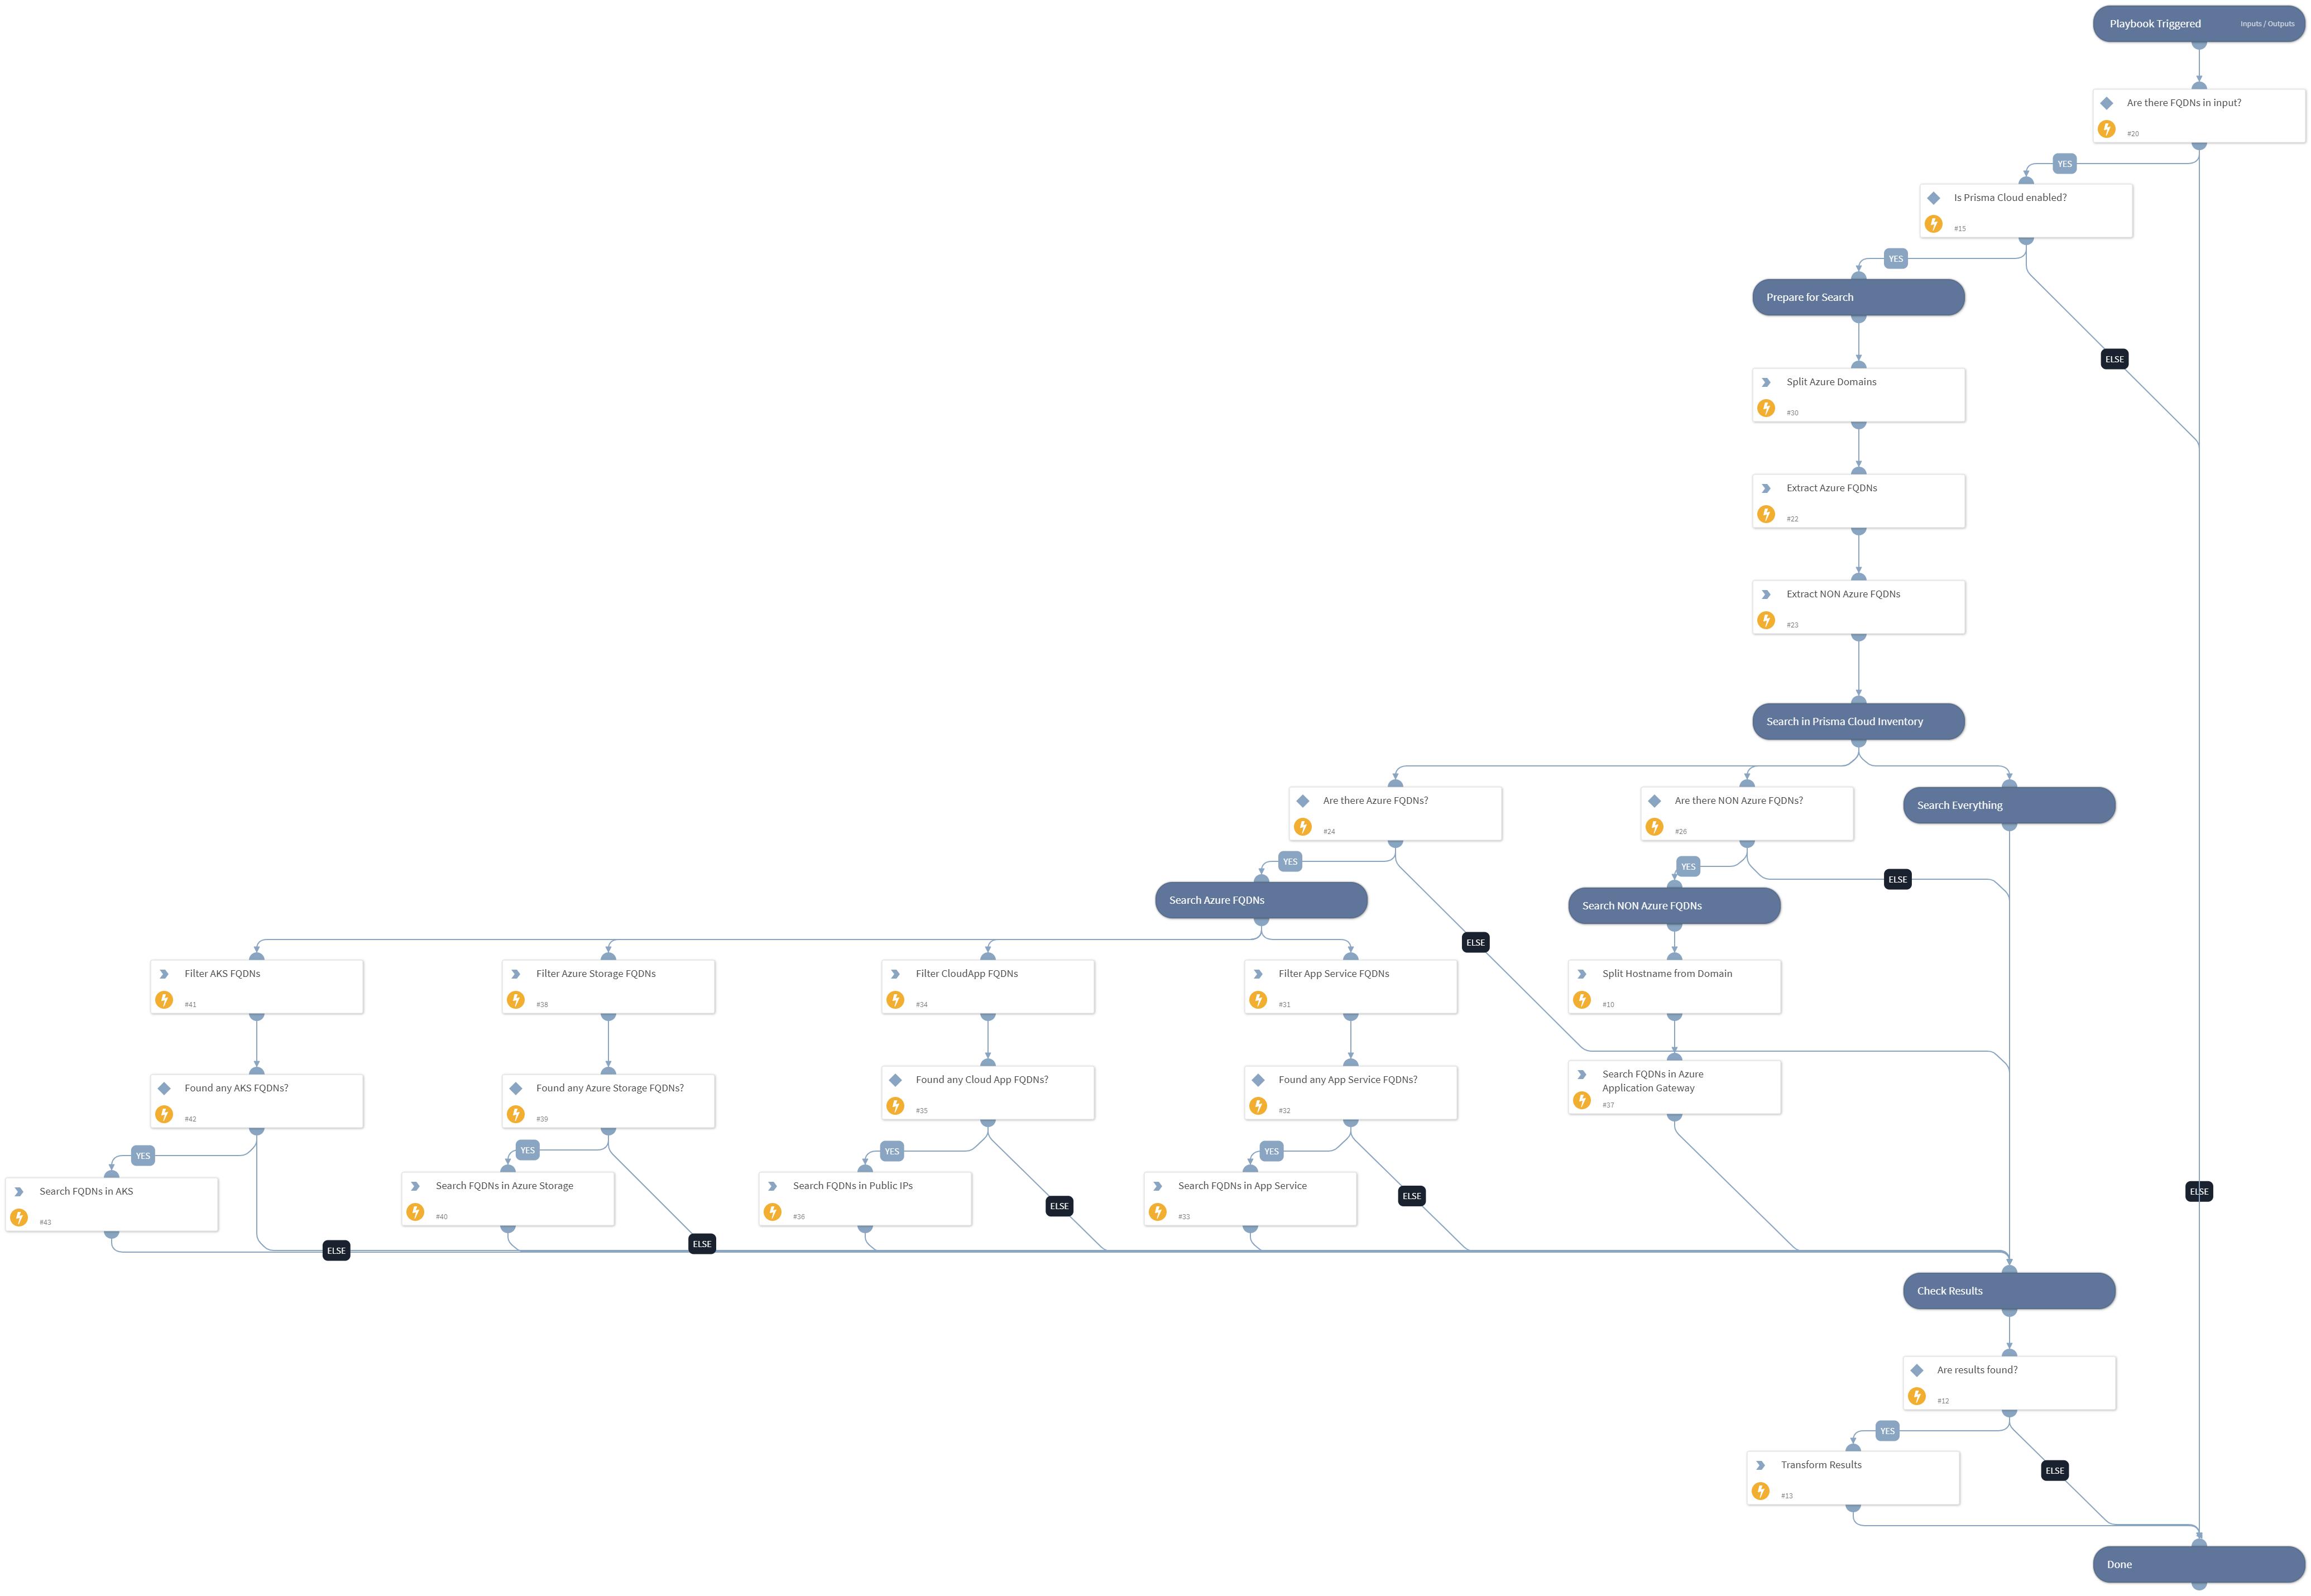 Prisma Cloud - Find Azure Resource by FQDN